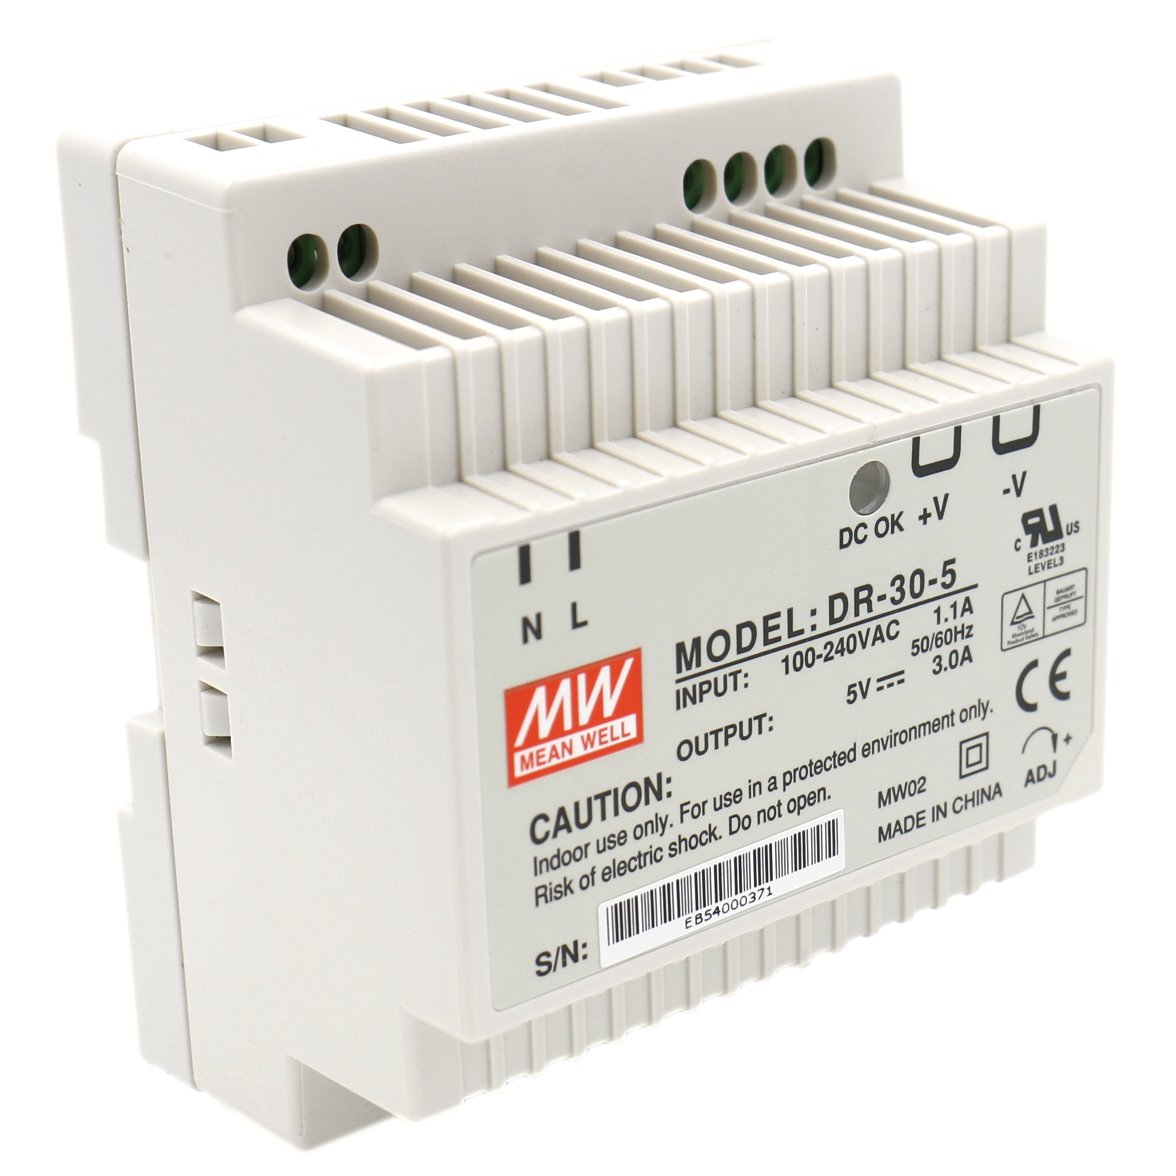 Heschen Meanwell alimentation de commutation DR-30-5 15W 5V 3A DIN-Rail UL CE listé Meanwell Enterprises Co.Ltd